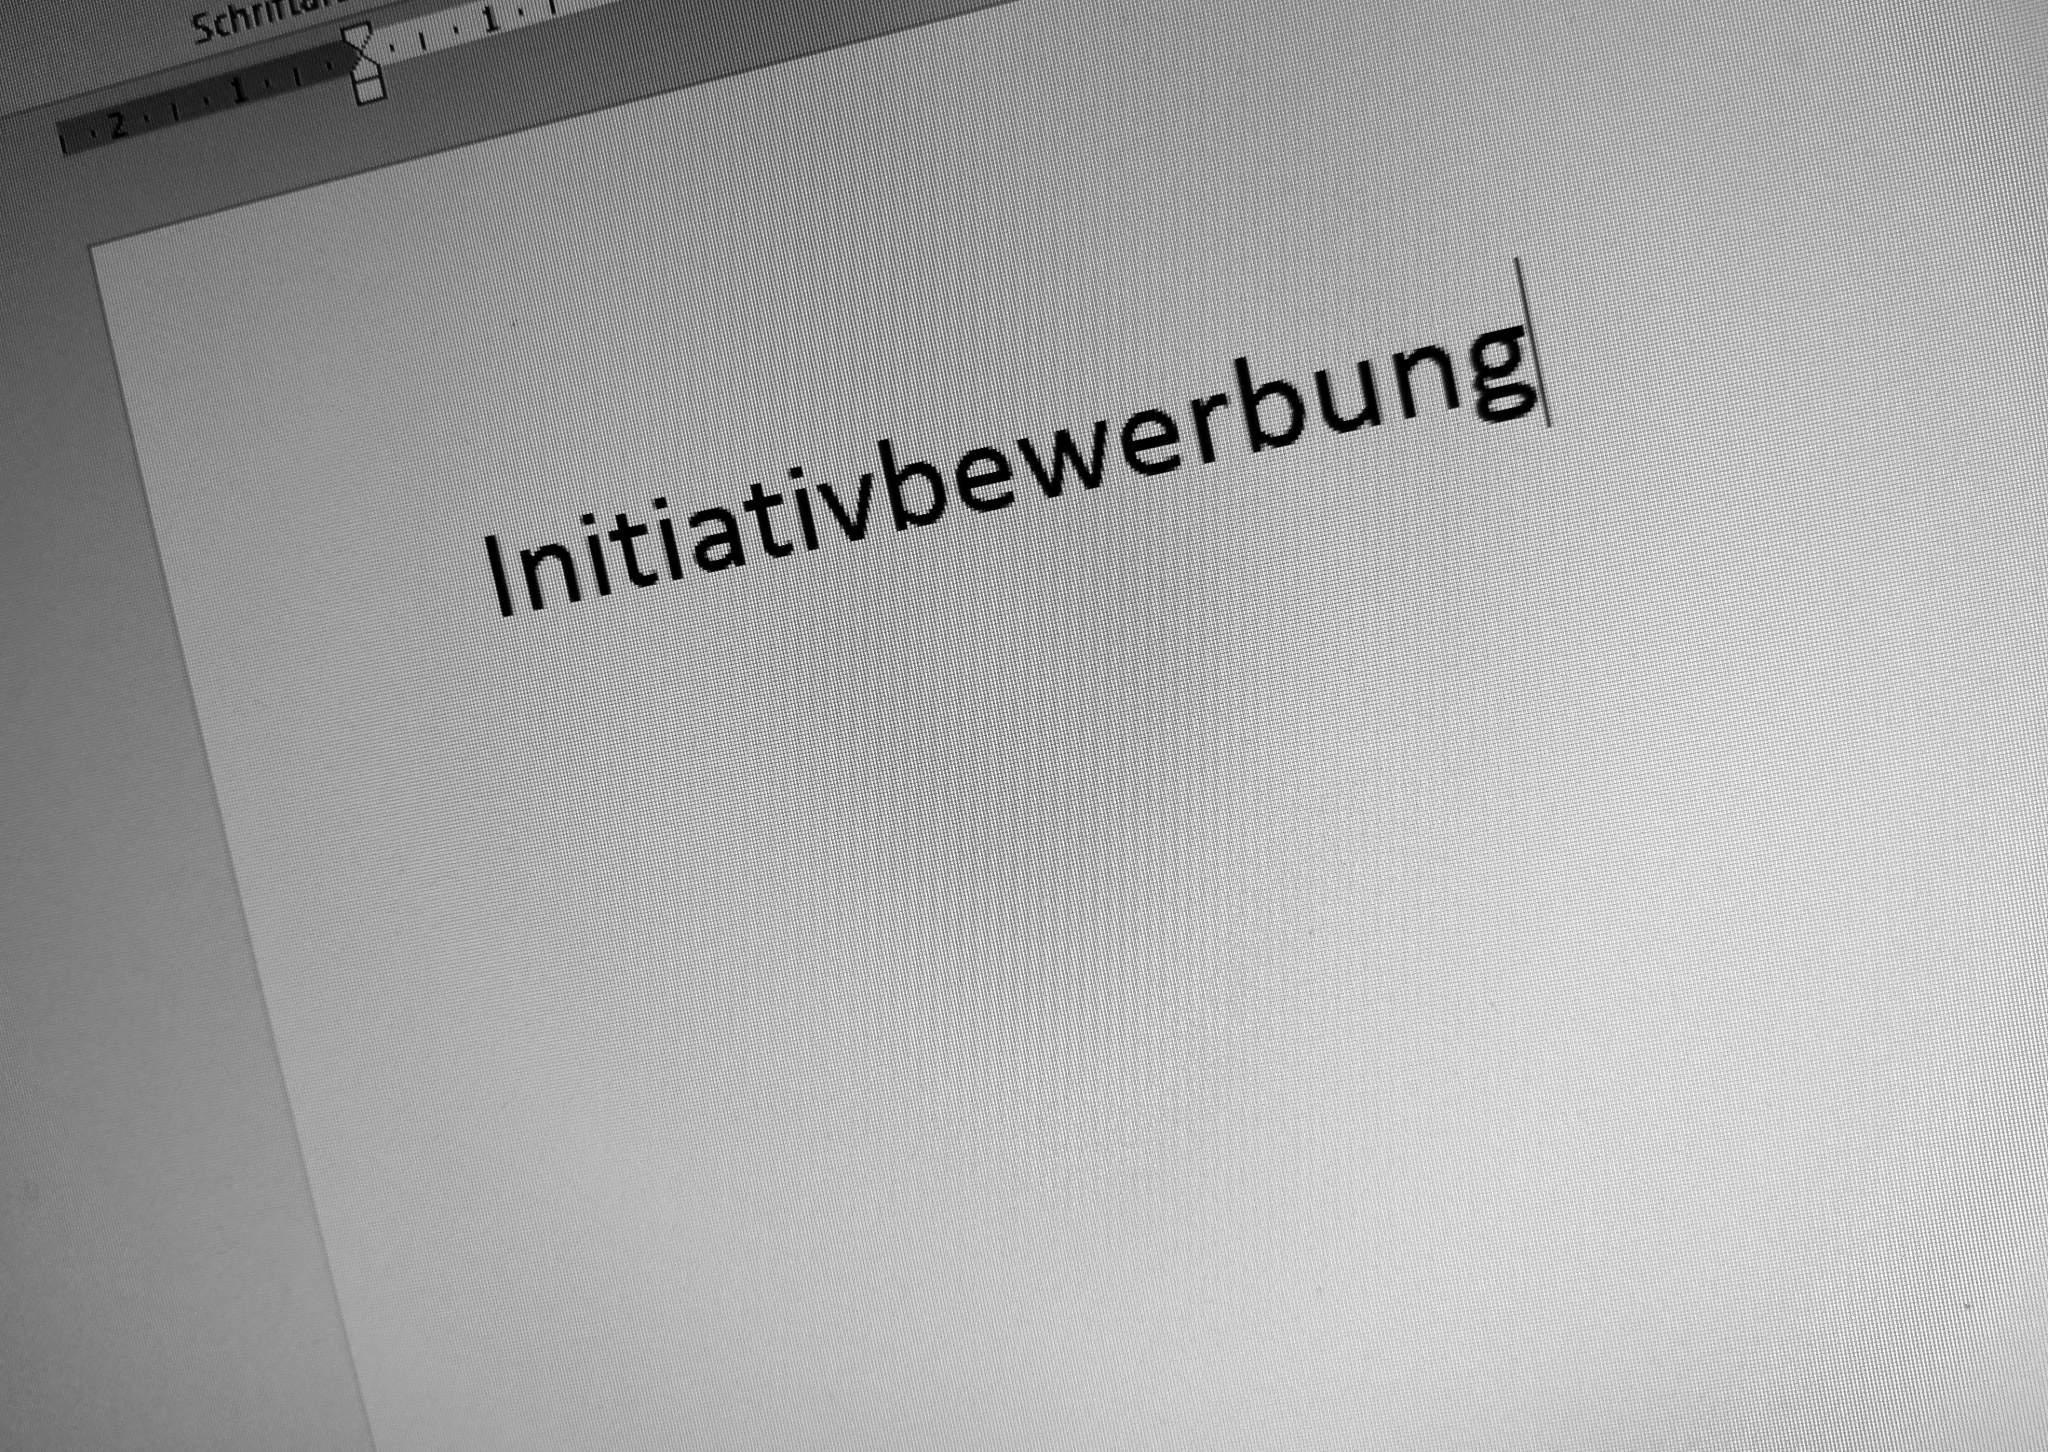 initiativbewerbung-online